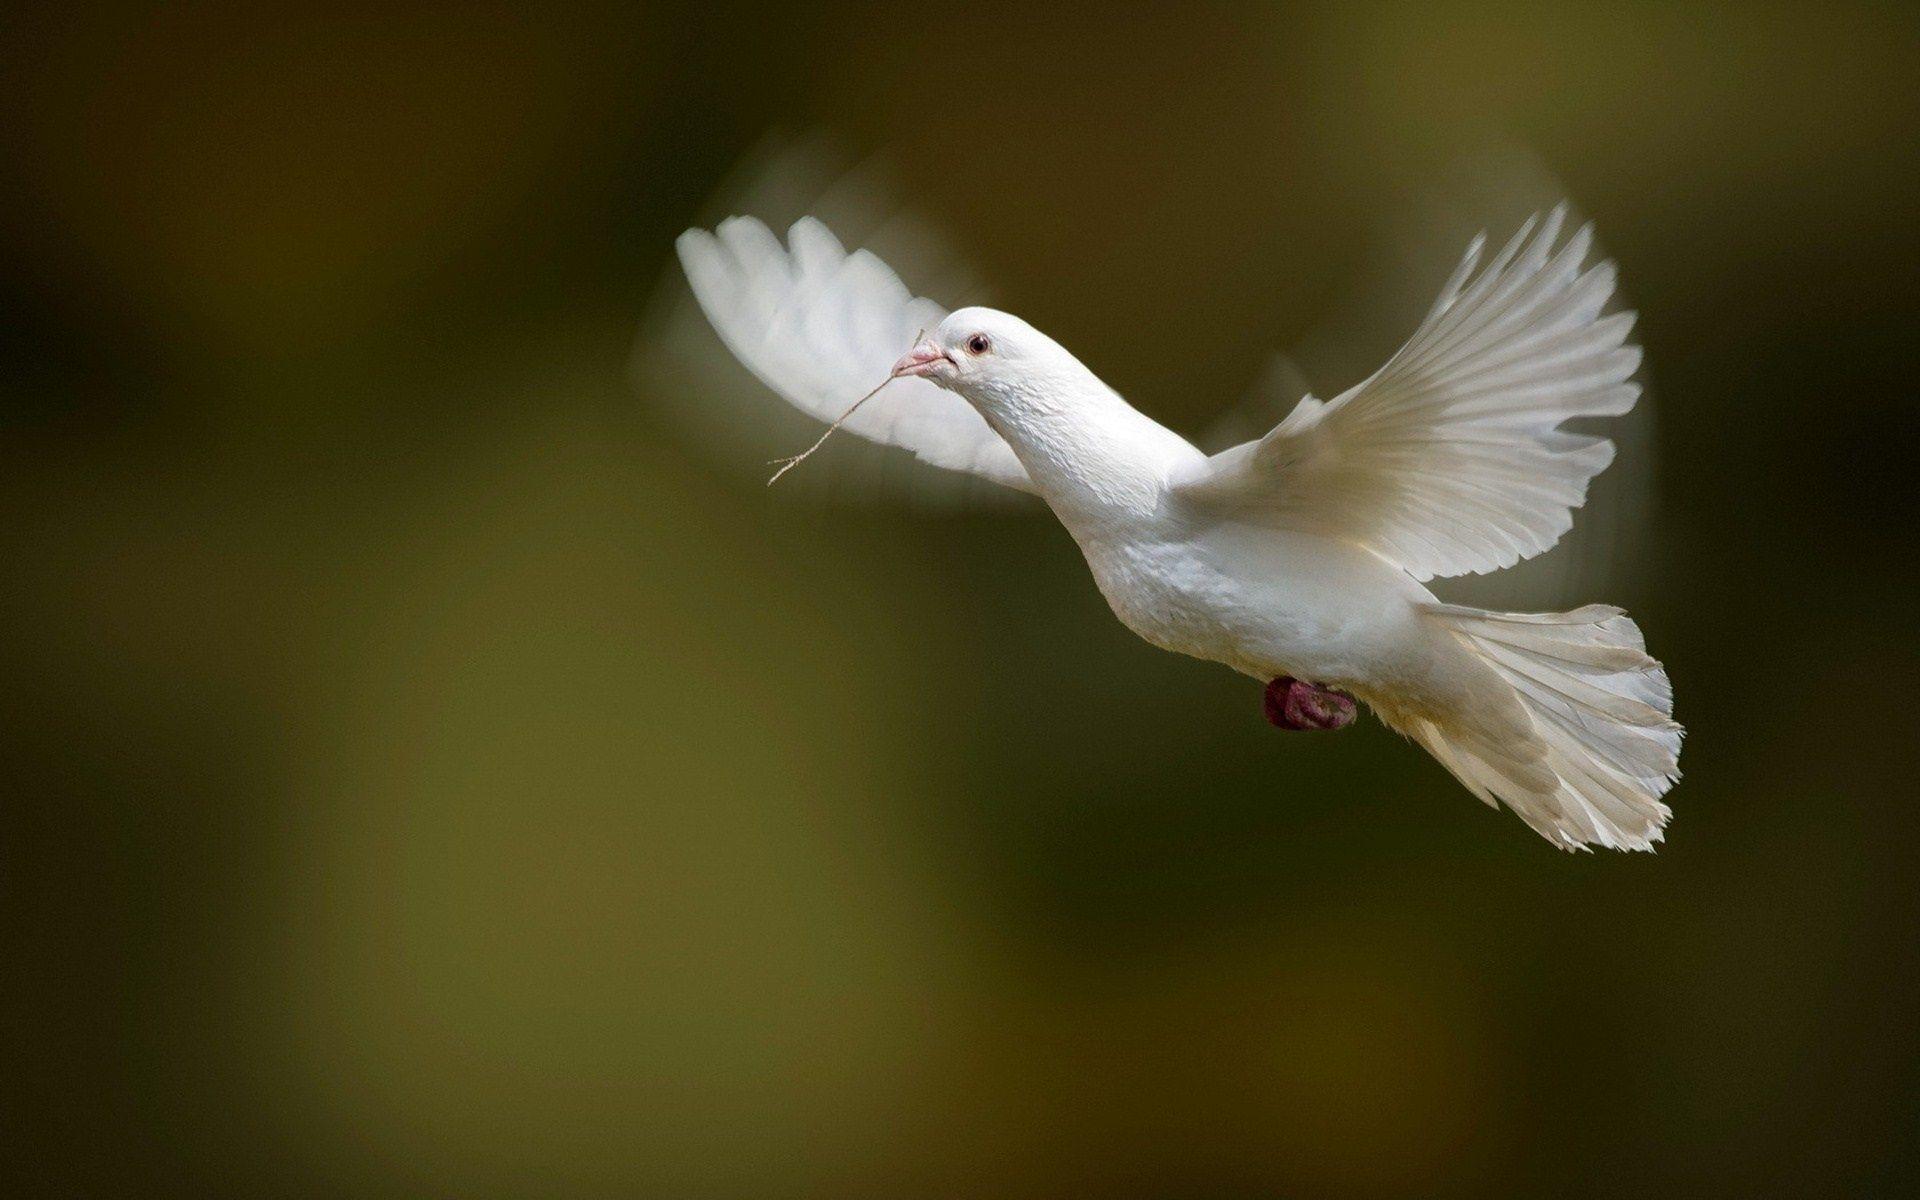 White Dove Bird Flying Photo Wallpaper 1920x1200 Oiseau En Vol Colombe Blanche Papier Peint Oiseaux